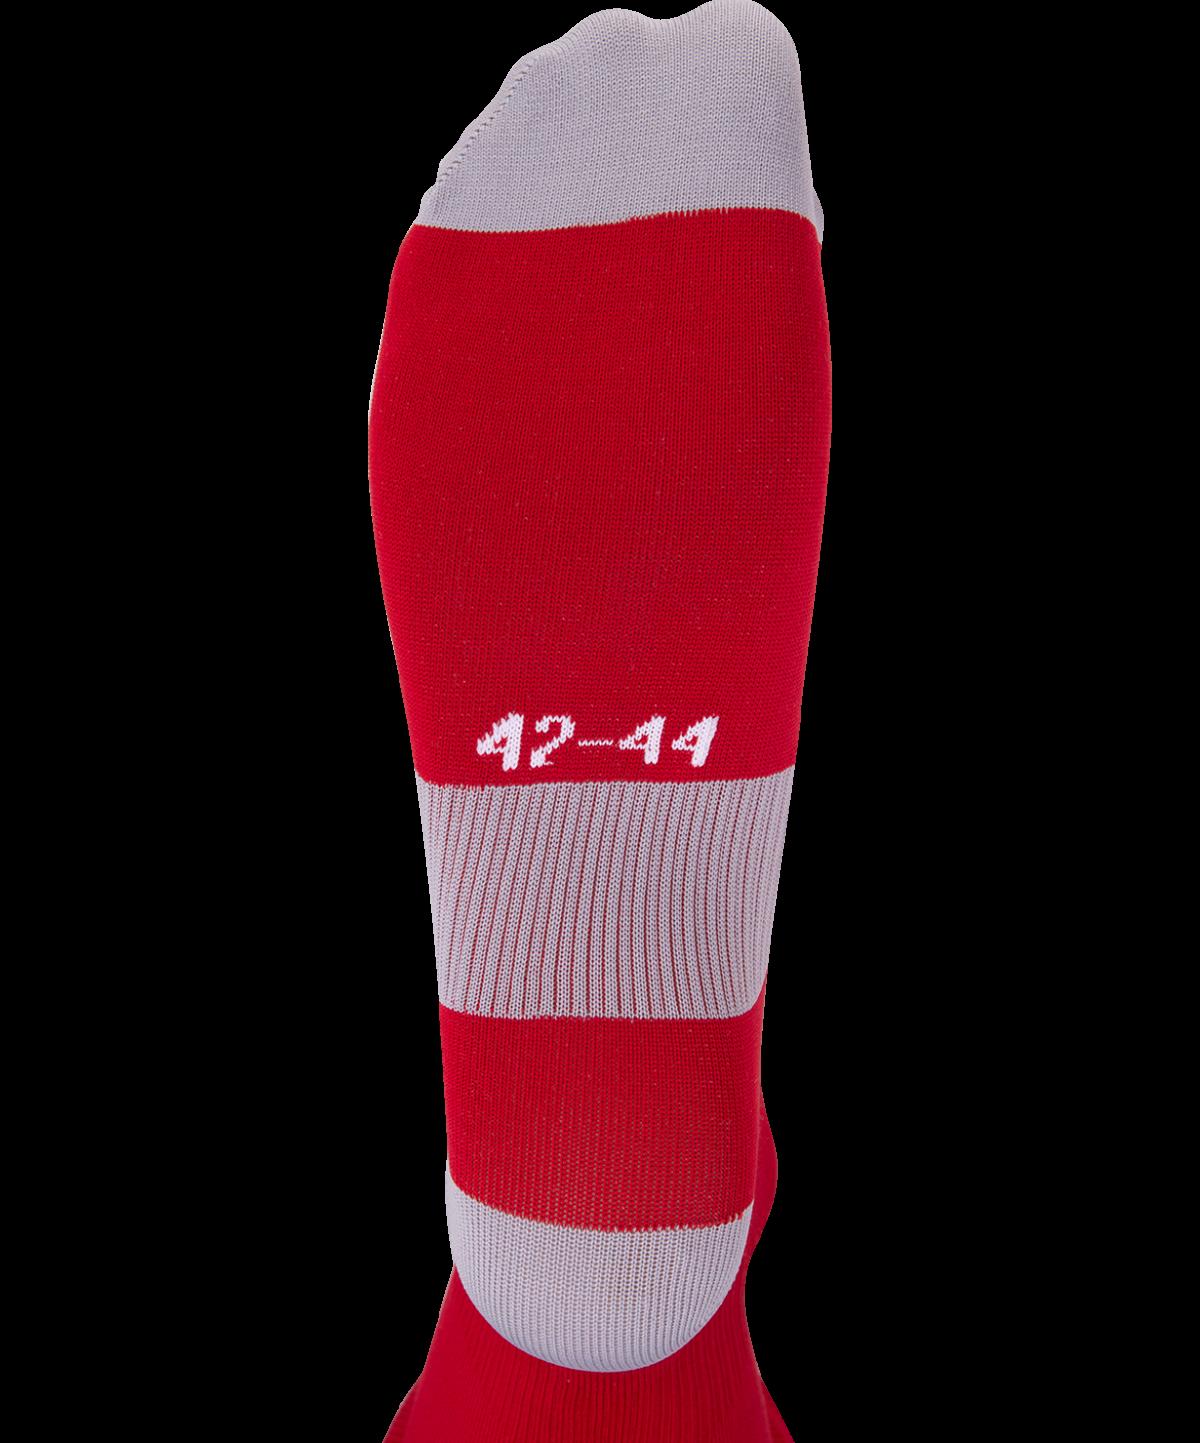 JOGEL Гетры футбольные Essentiаl, красный/серый  JA-006 - 3